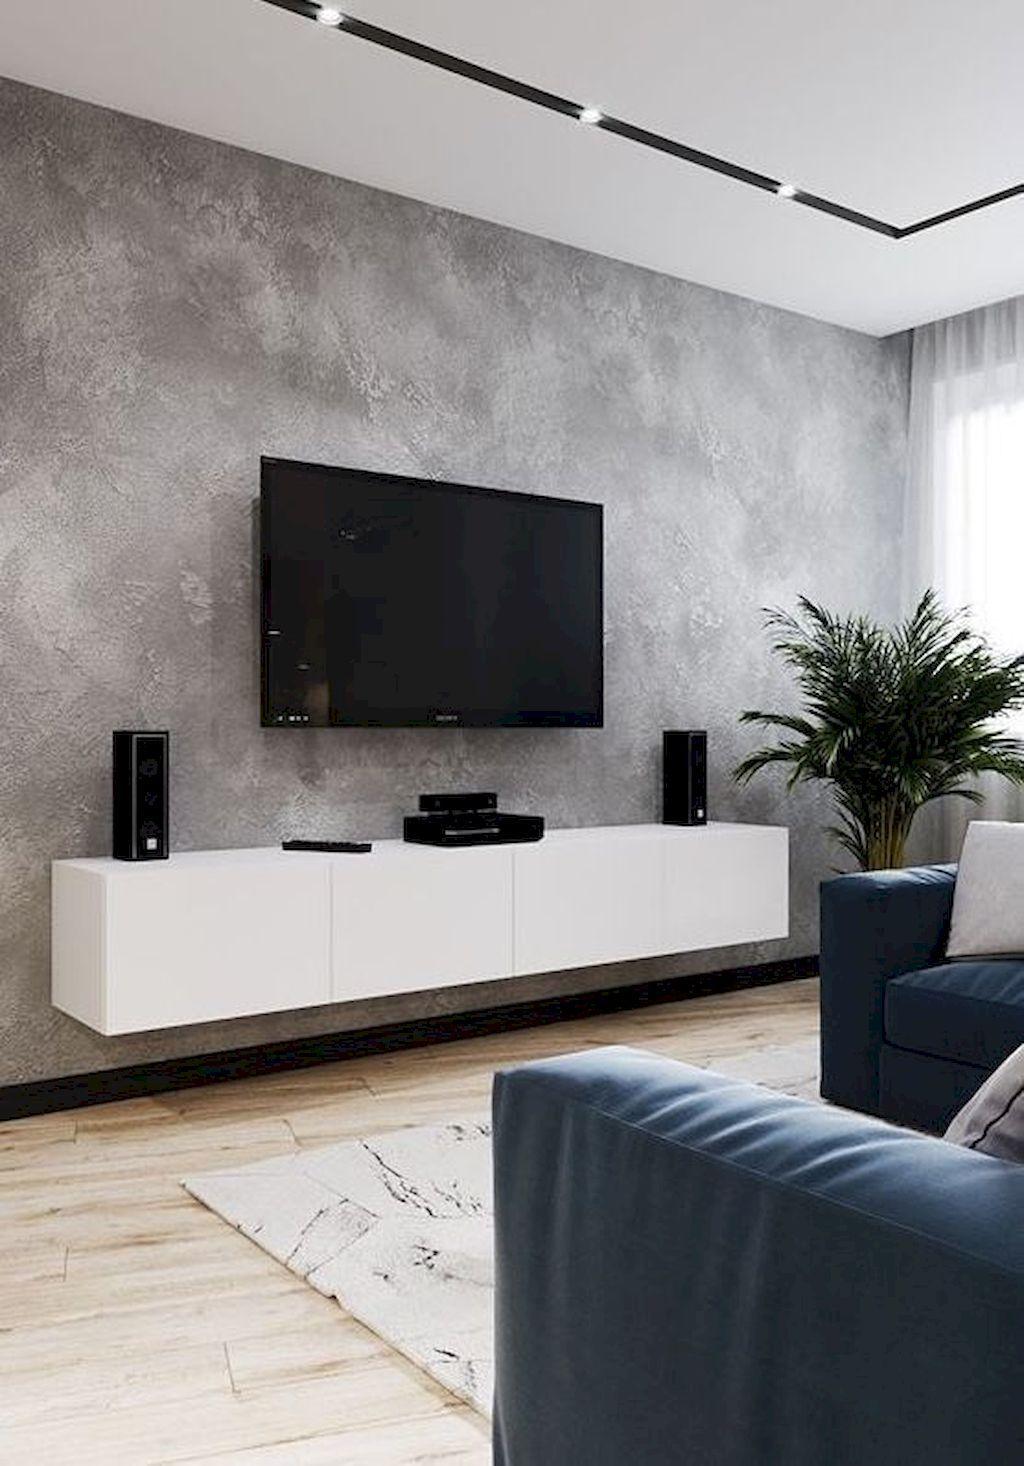 Shocking Tv Stands Do Not Must Be An Eyesore Minimalist Living Room Living Room Decor Apartment Living Room Design Modern #television #set #living #room